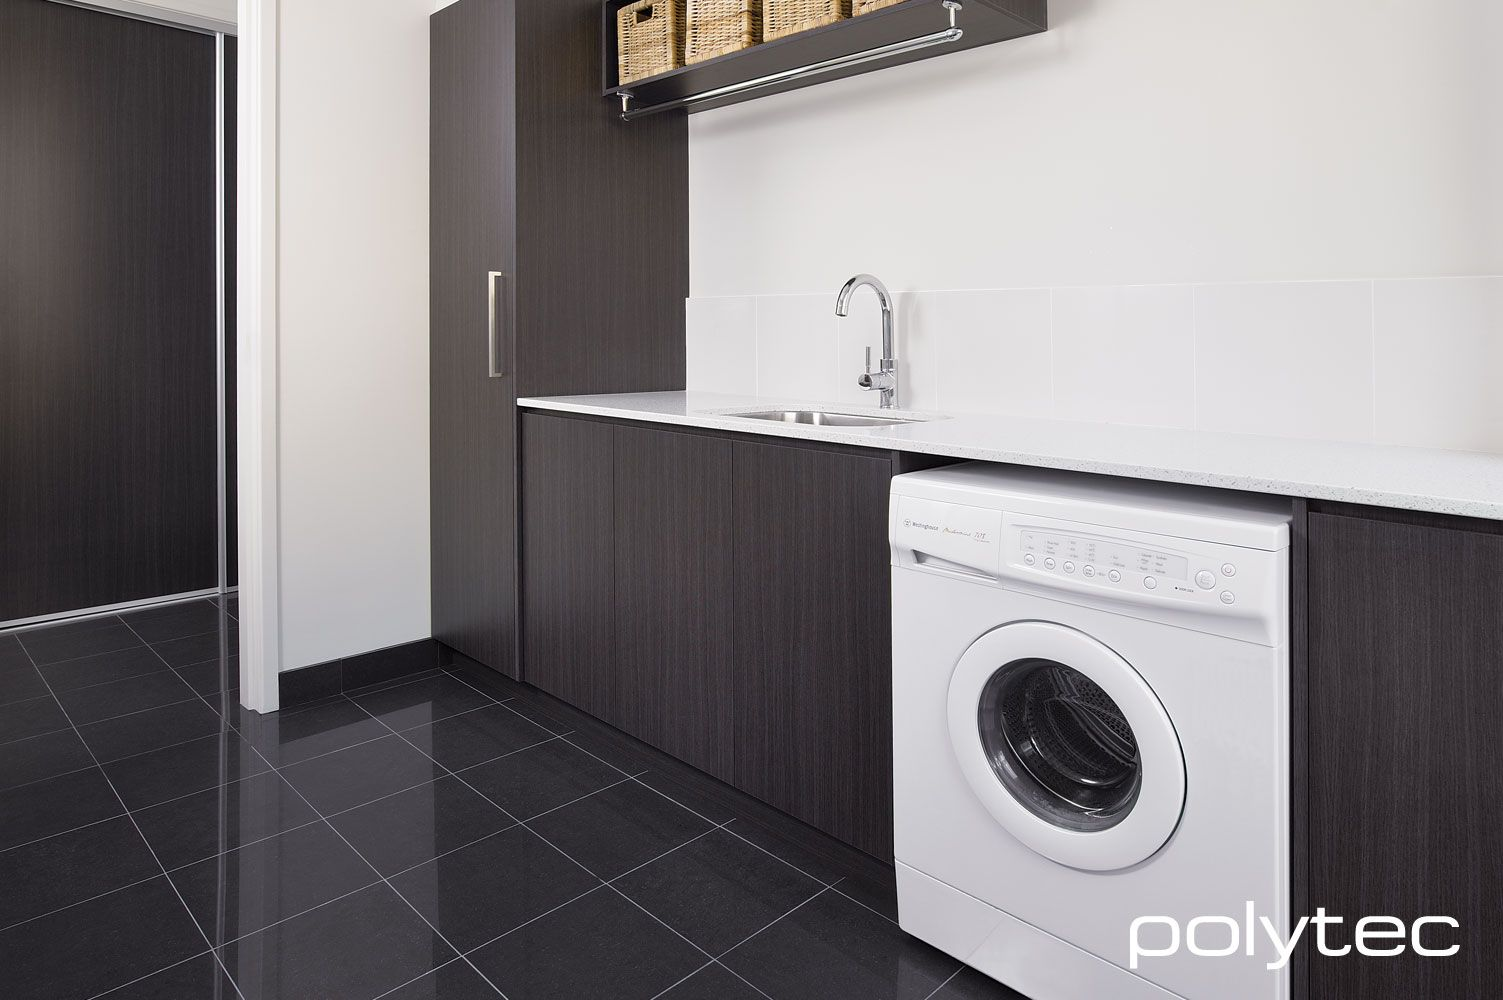 Pin On Kitchens Polytec Borg Decorative